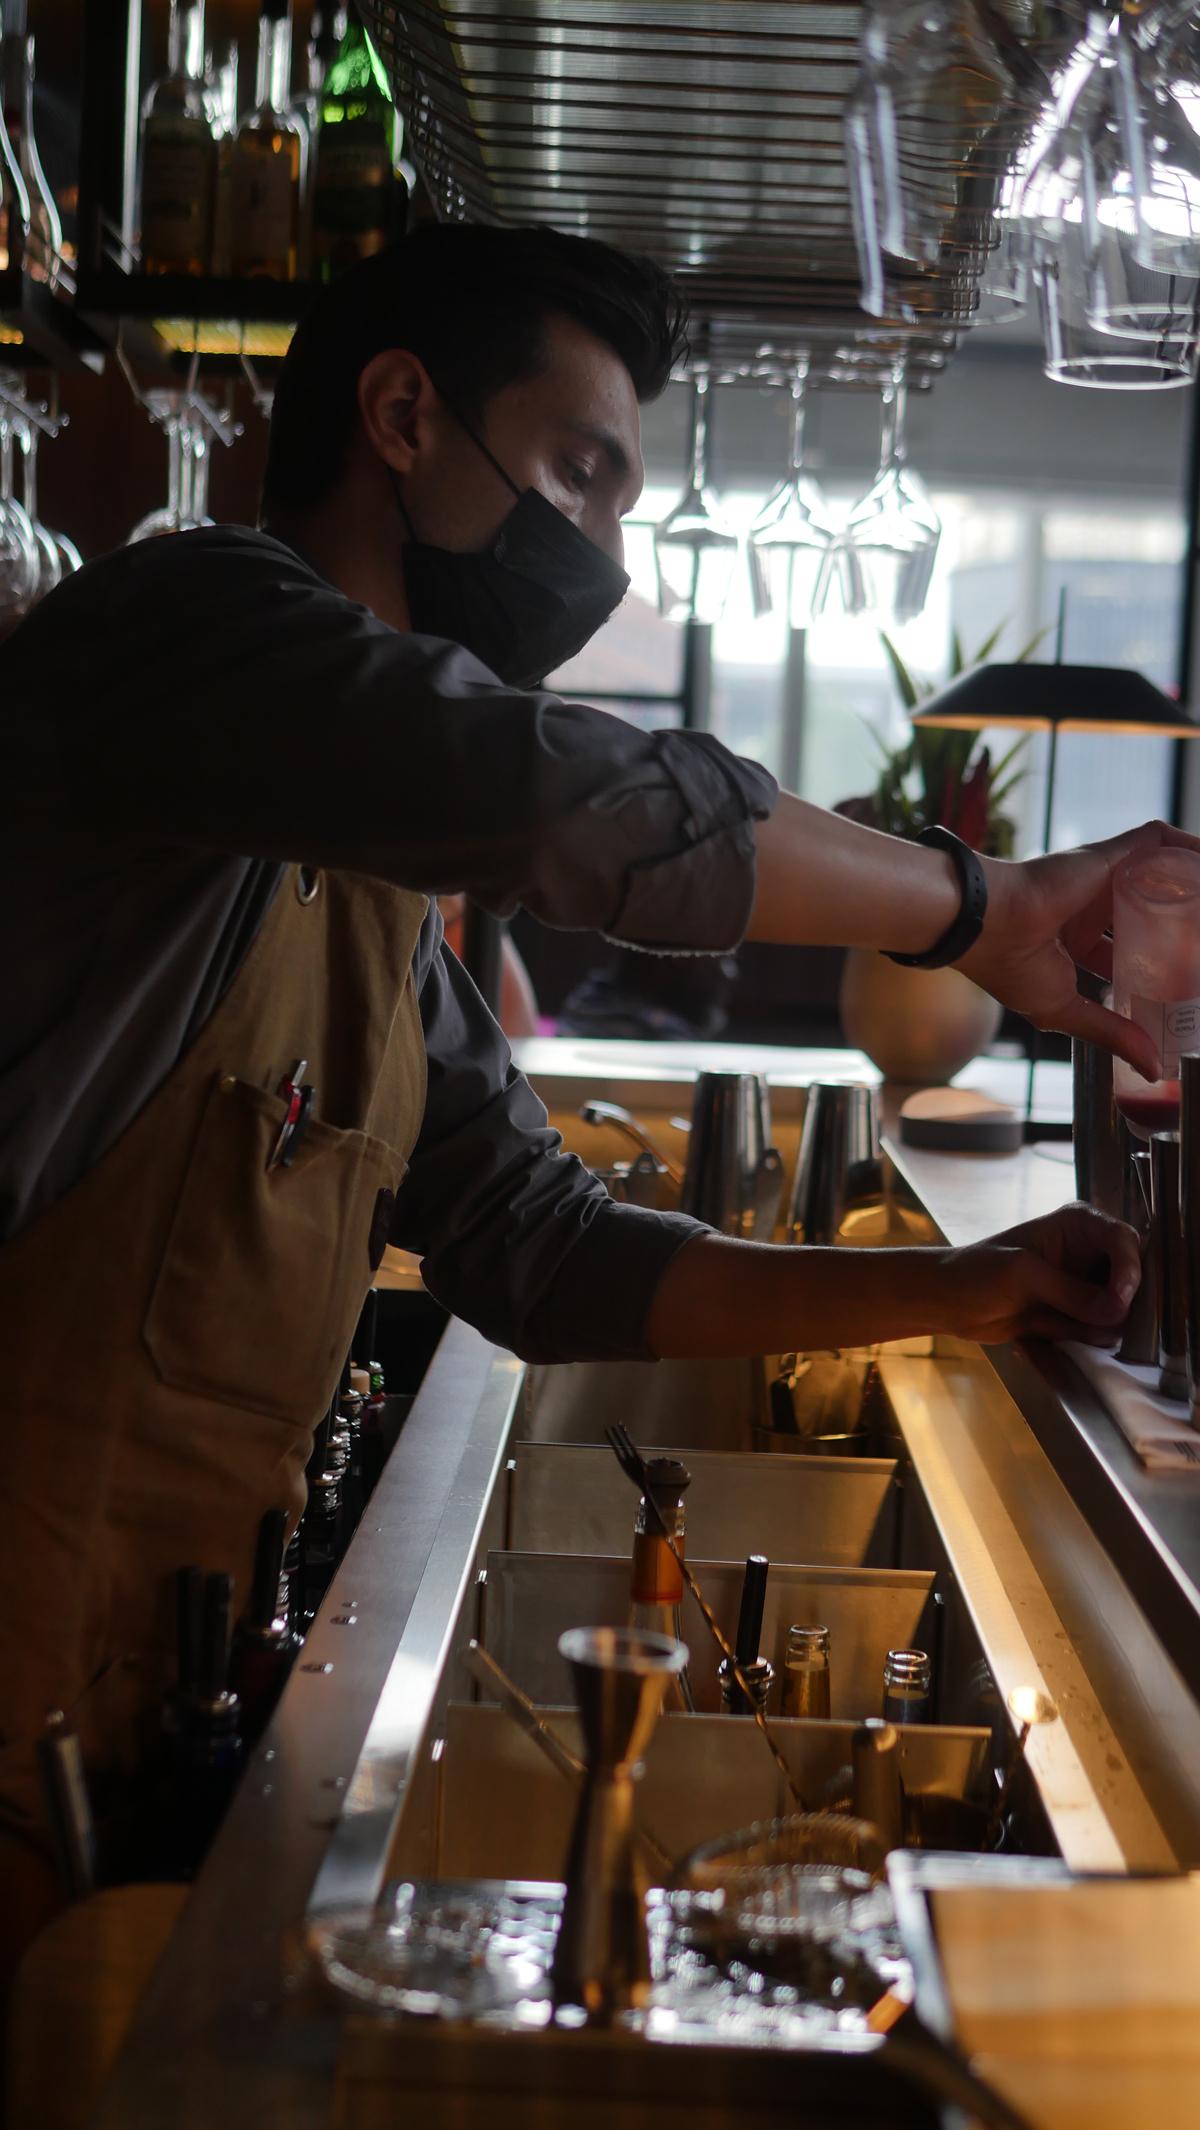 Magenta barman